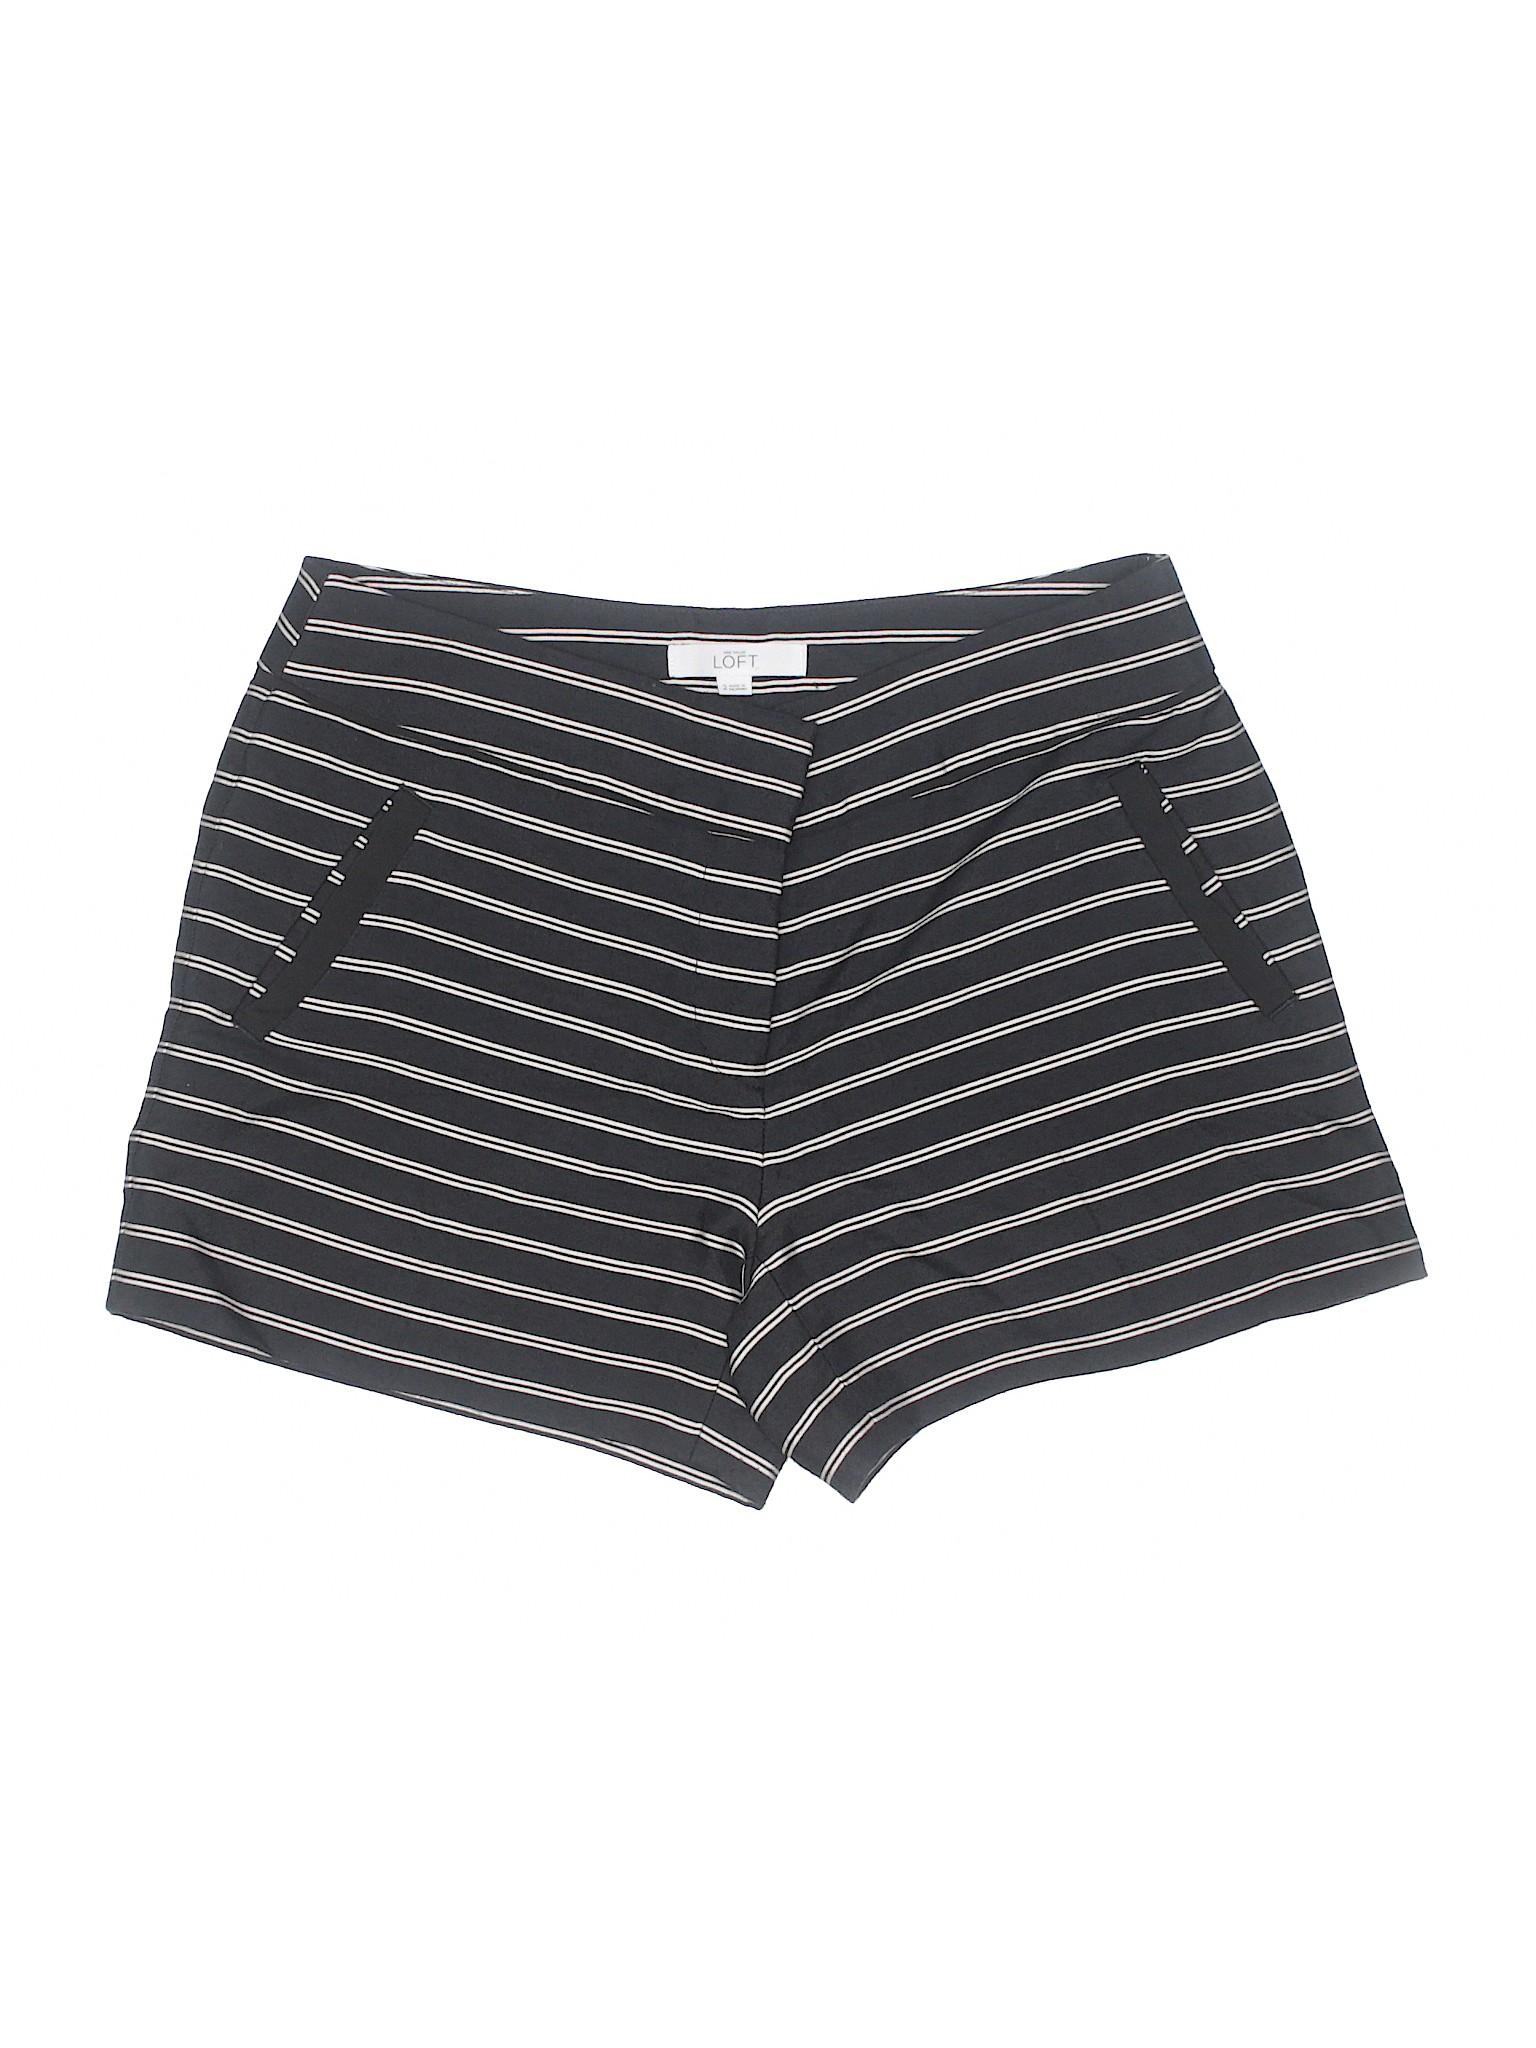 LOFT Shorts Ann Boutique Khaki Taylor wx0qOYc7v